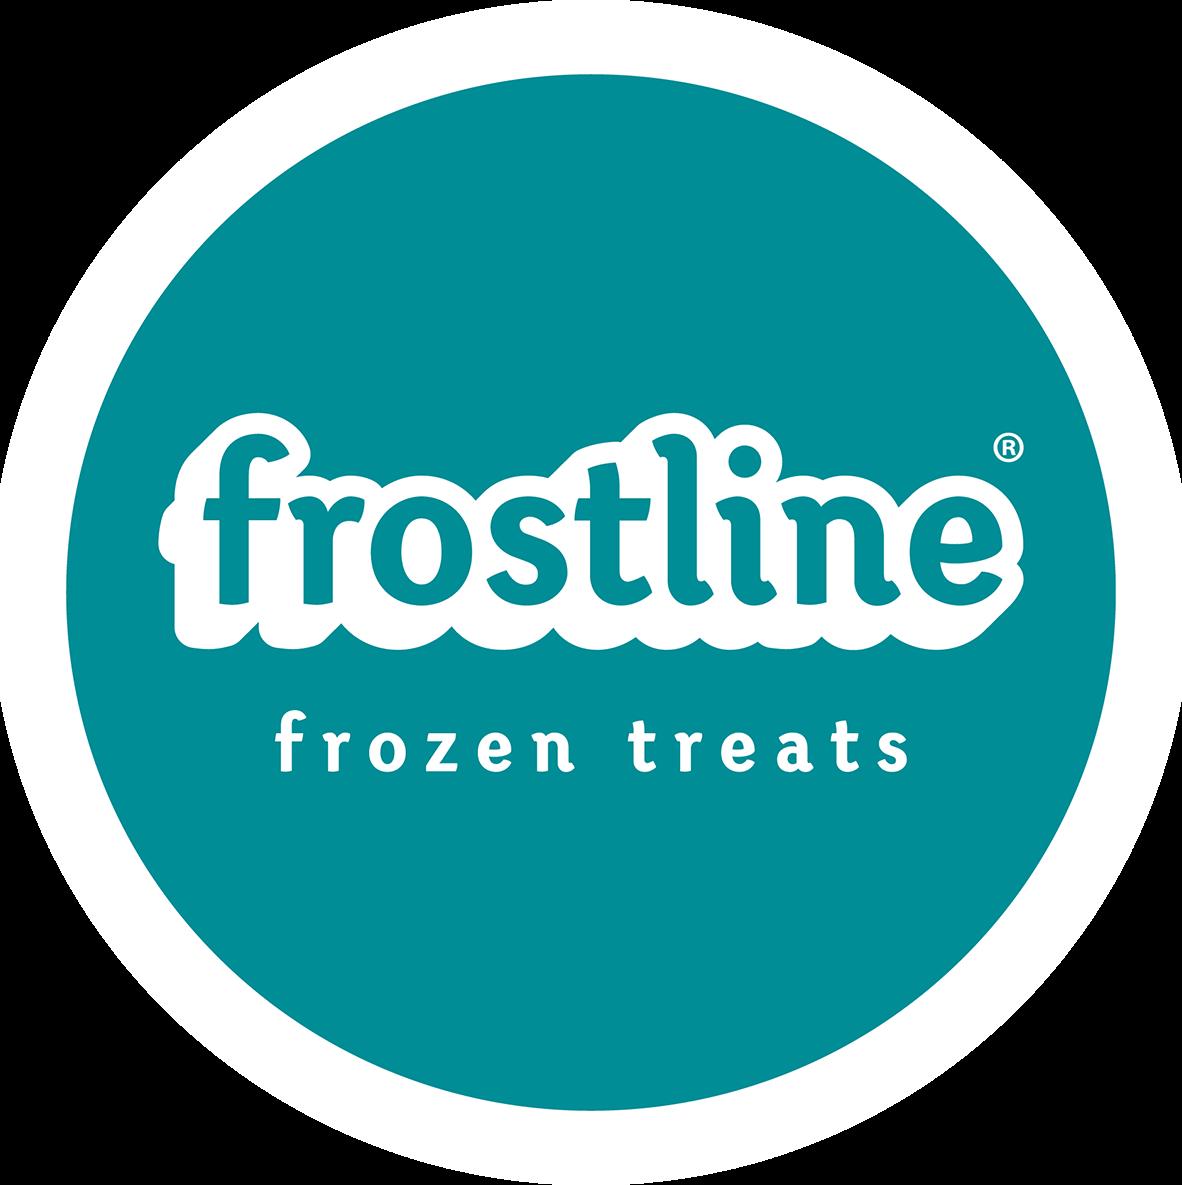 Frostline® Frozen Treats Blog